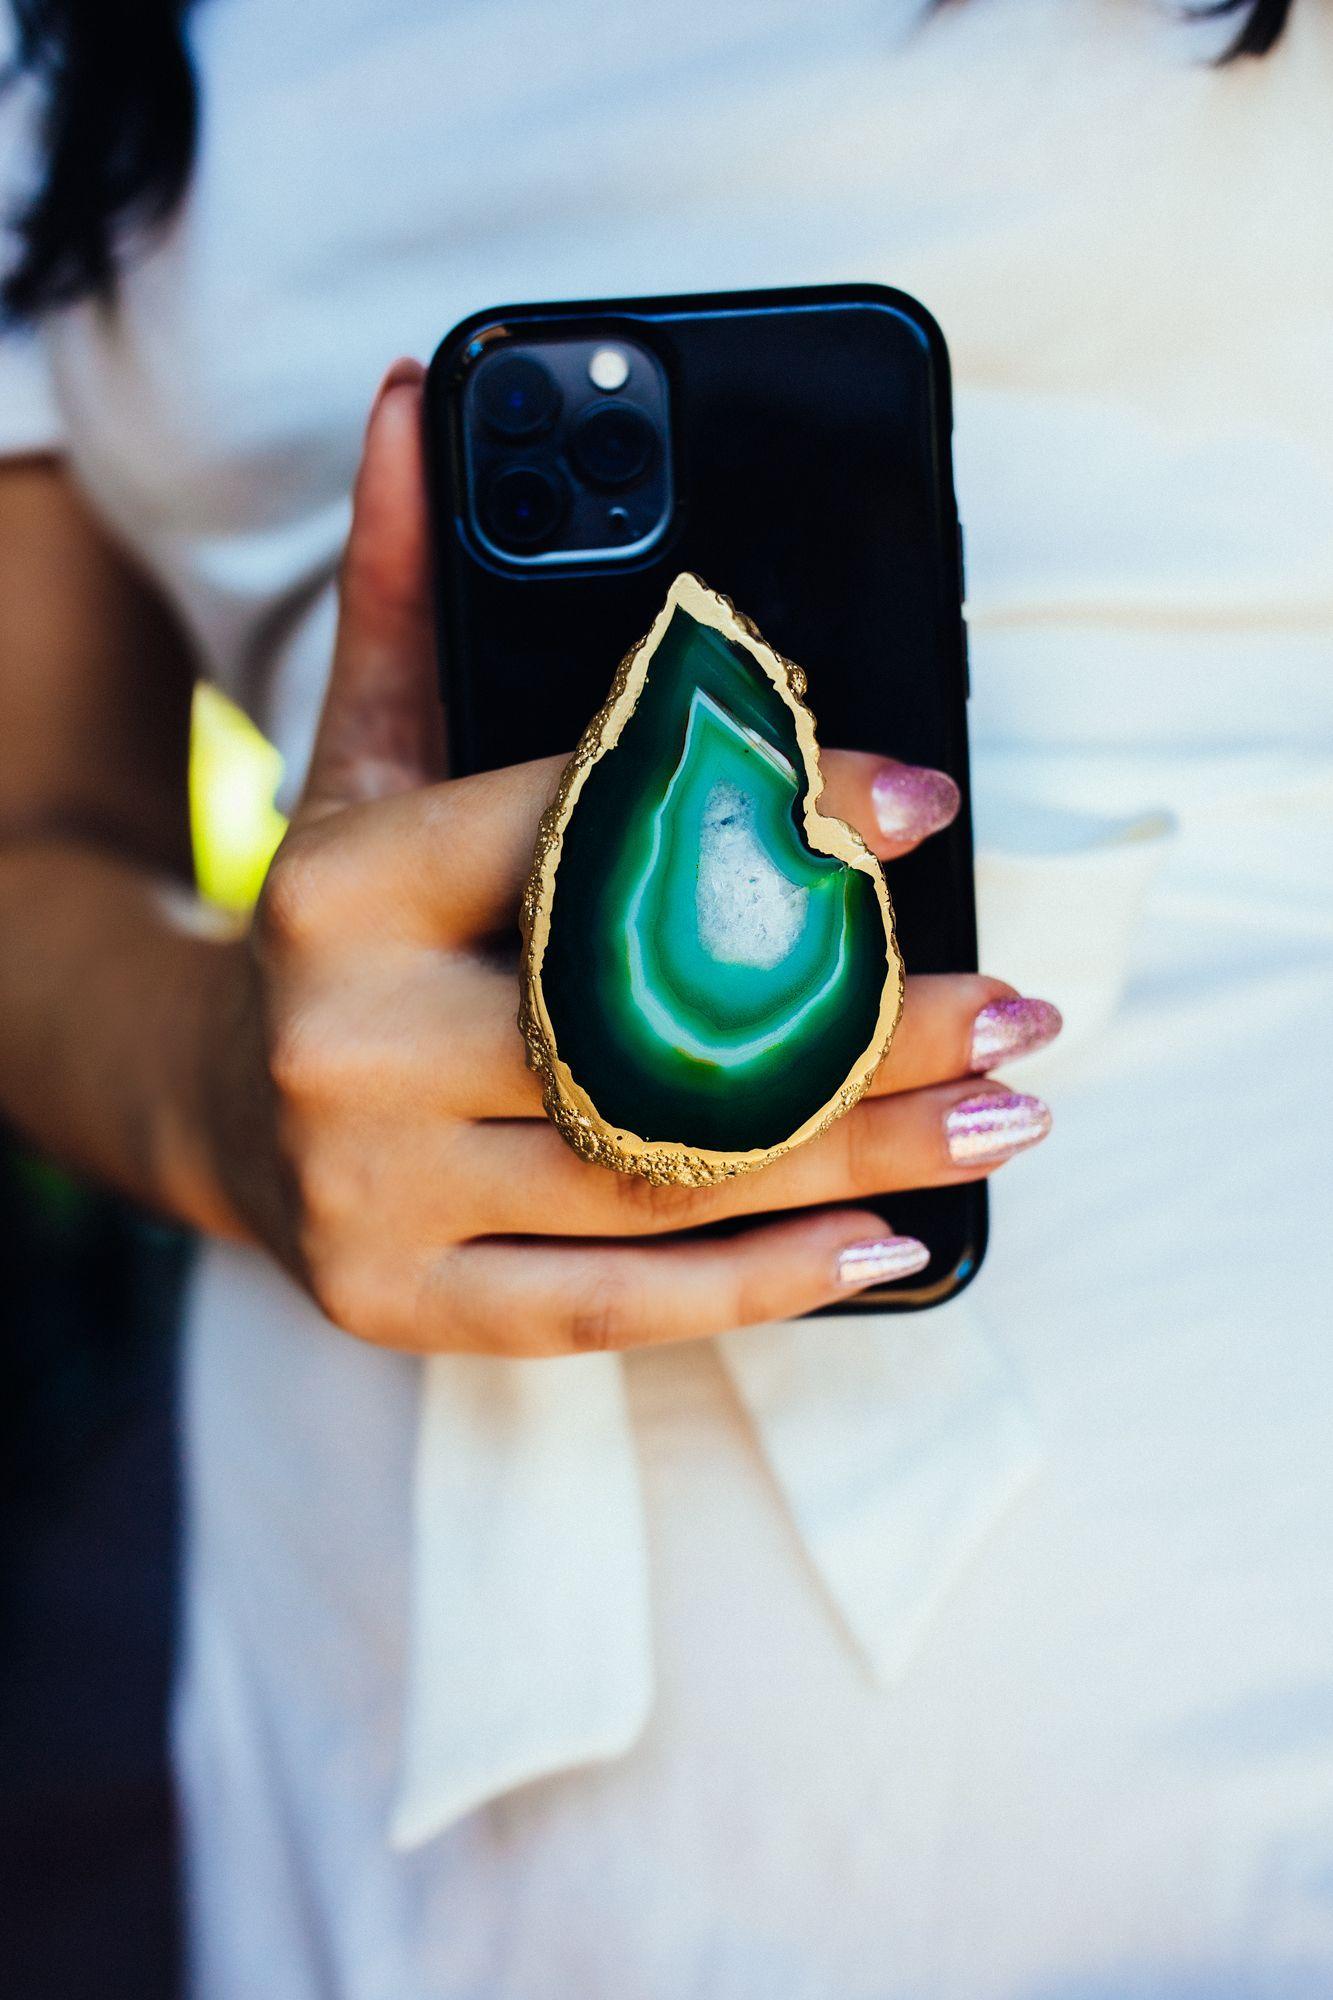 Pop Socket Samsung phone accessories Acrylic Pour Paint Pop Socket Phone Grip RESIN Coated IPhone